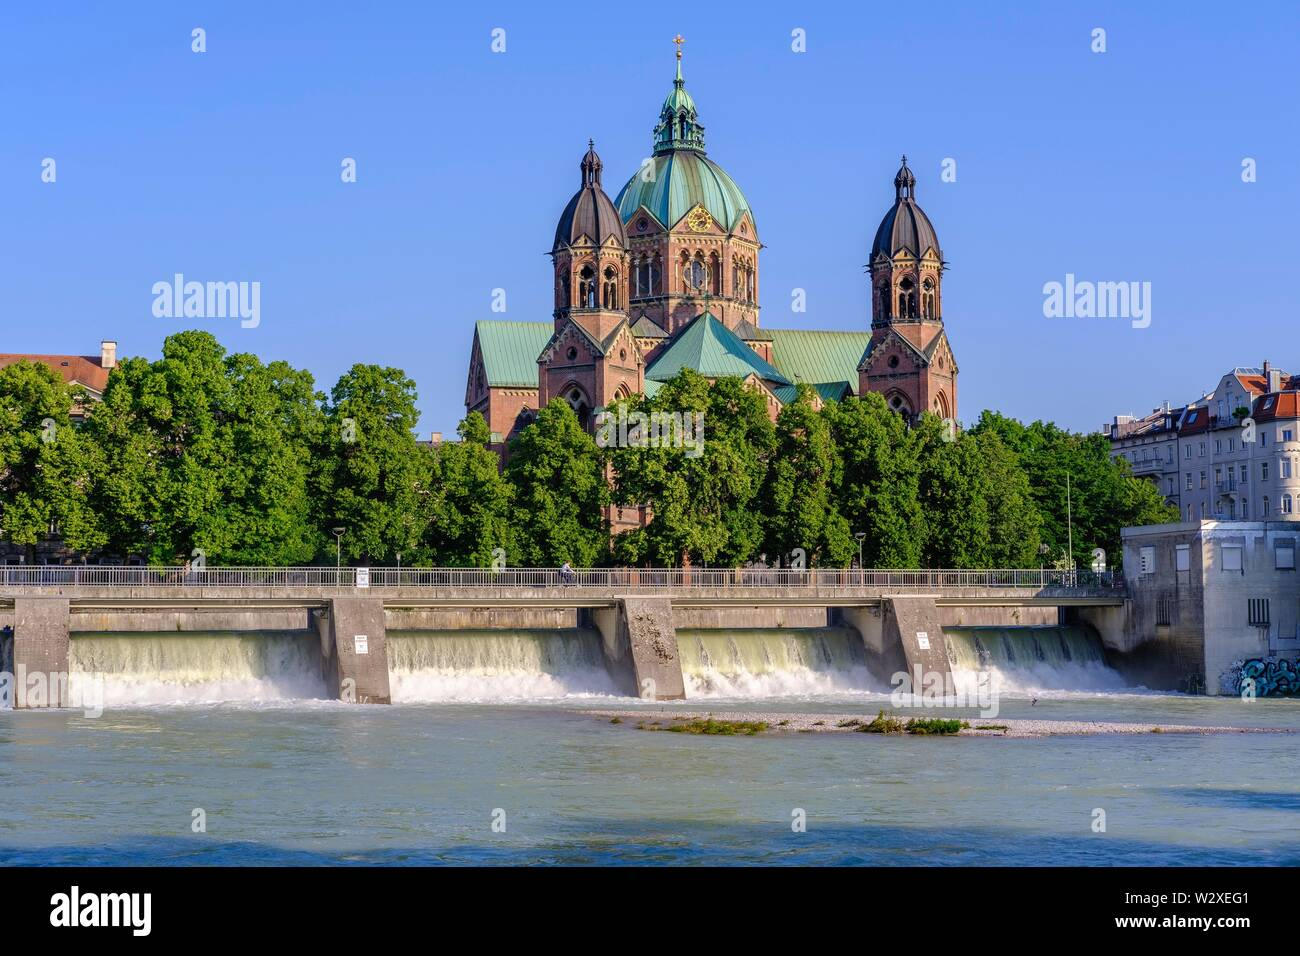 Church St. Lukas, Isar with Wehrsteg, Lehel, Munich, Upper Bavaria, Bavaria, Germany - Stock Image